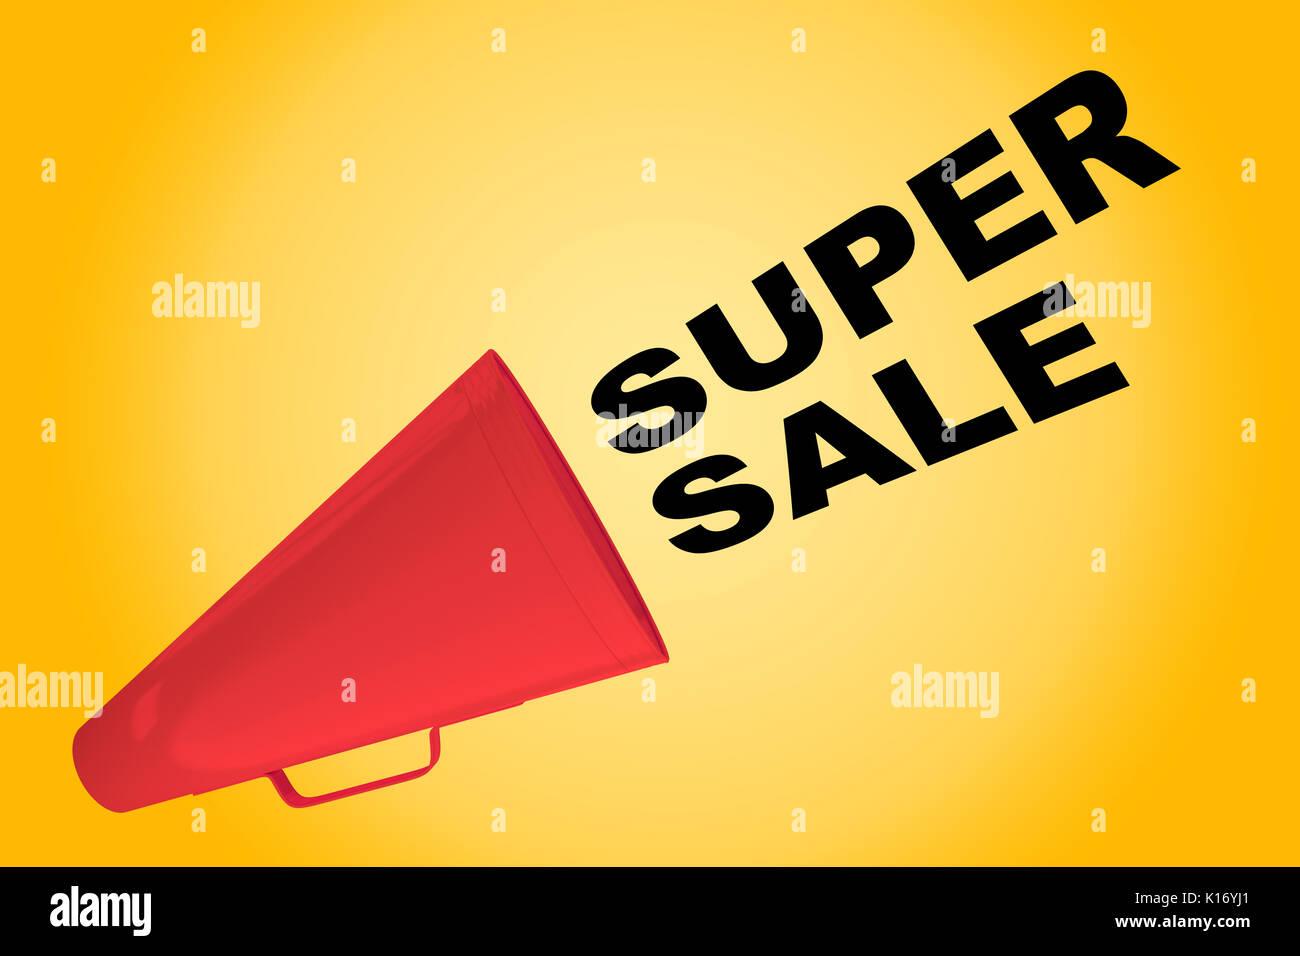 Super Sale Stock Photos Amp Super Sale Stock Images Alamy